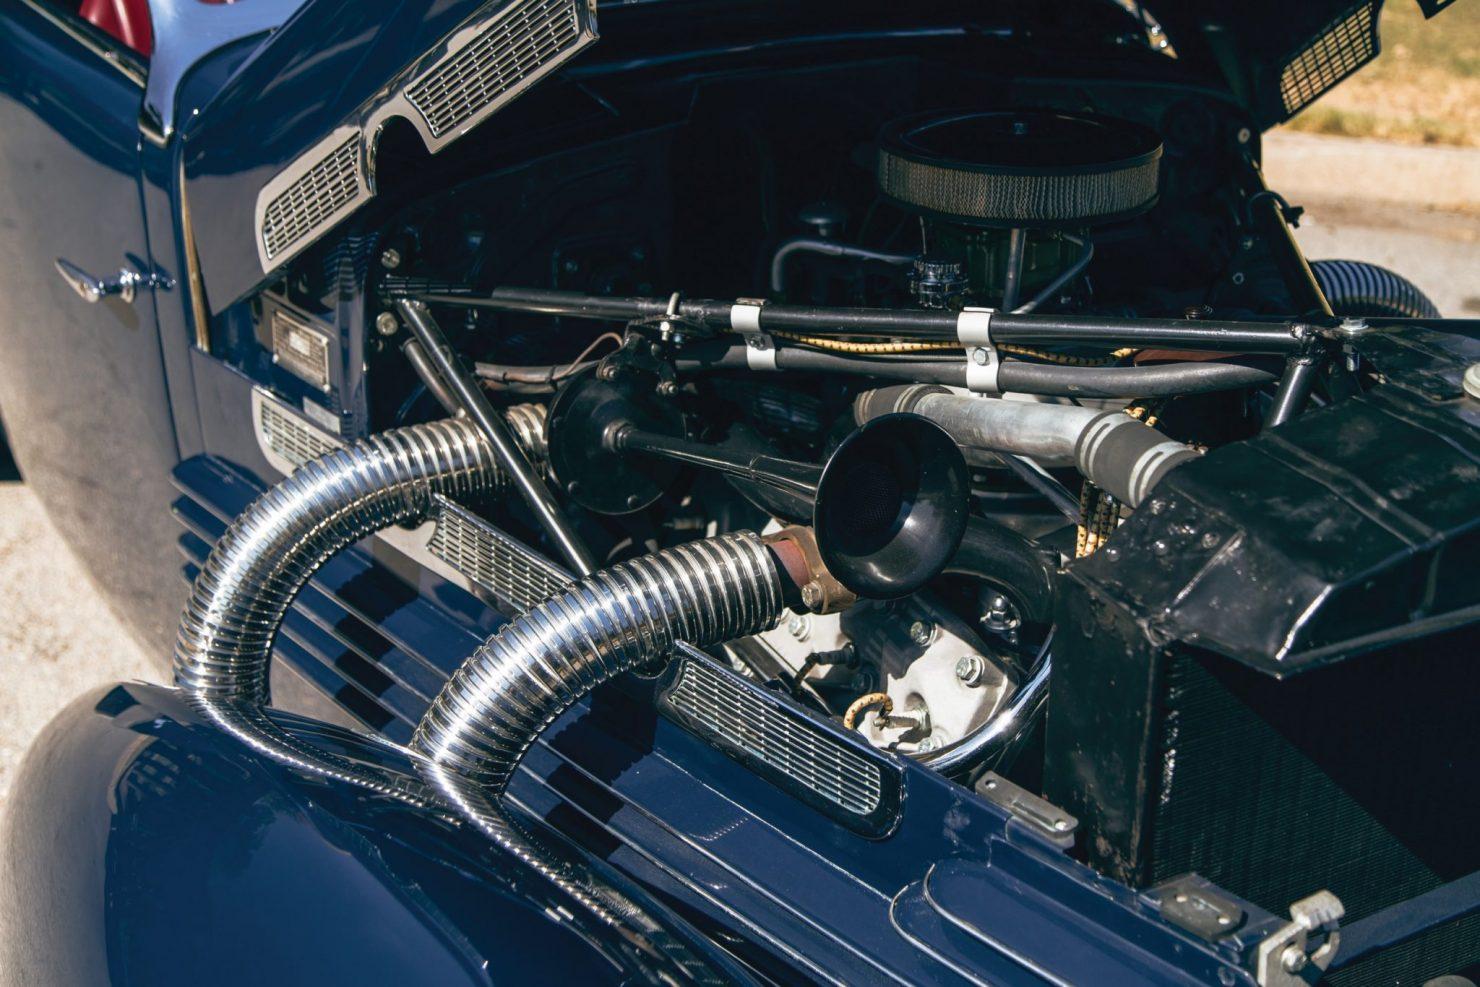 cord 812 supercharged phaeton 9 1480x987 - 1937 Cord 812 Supercharged Phaeton